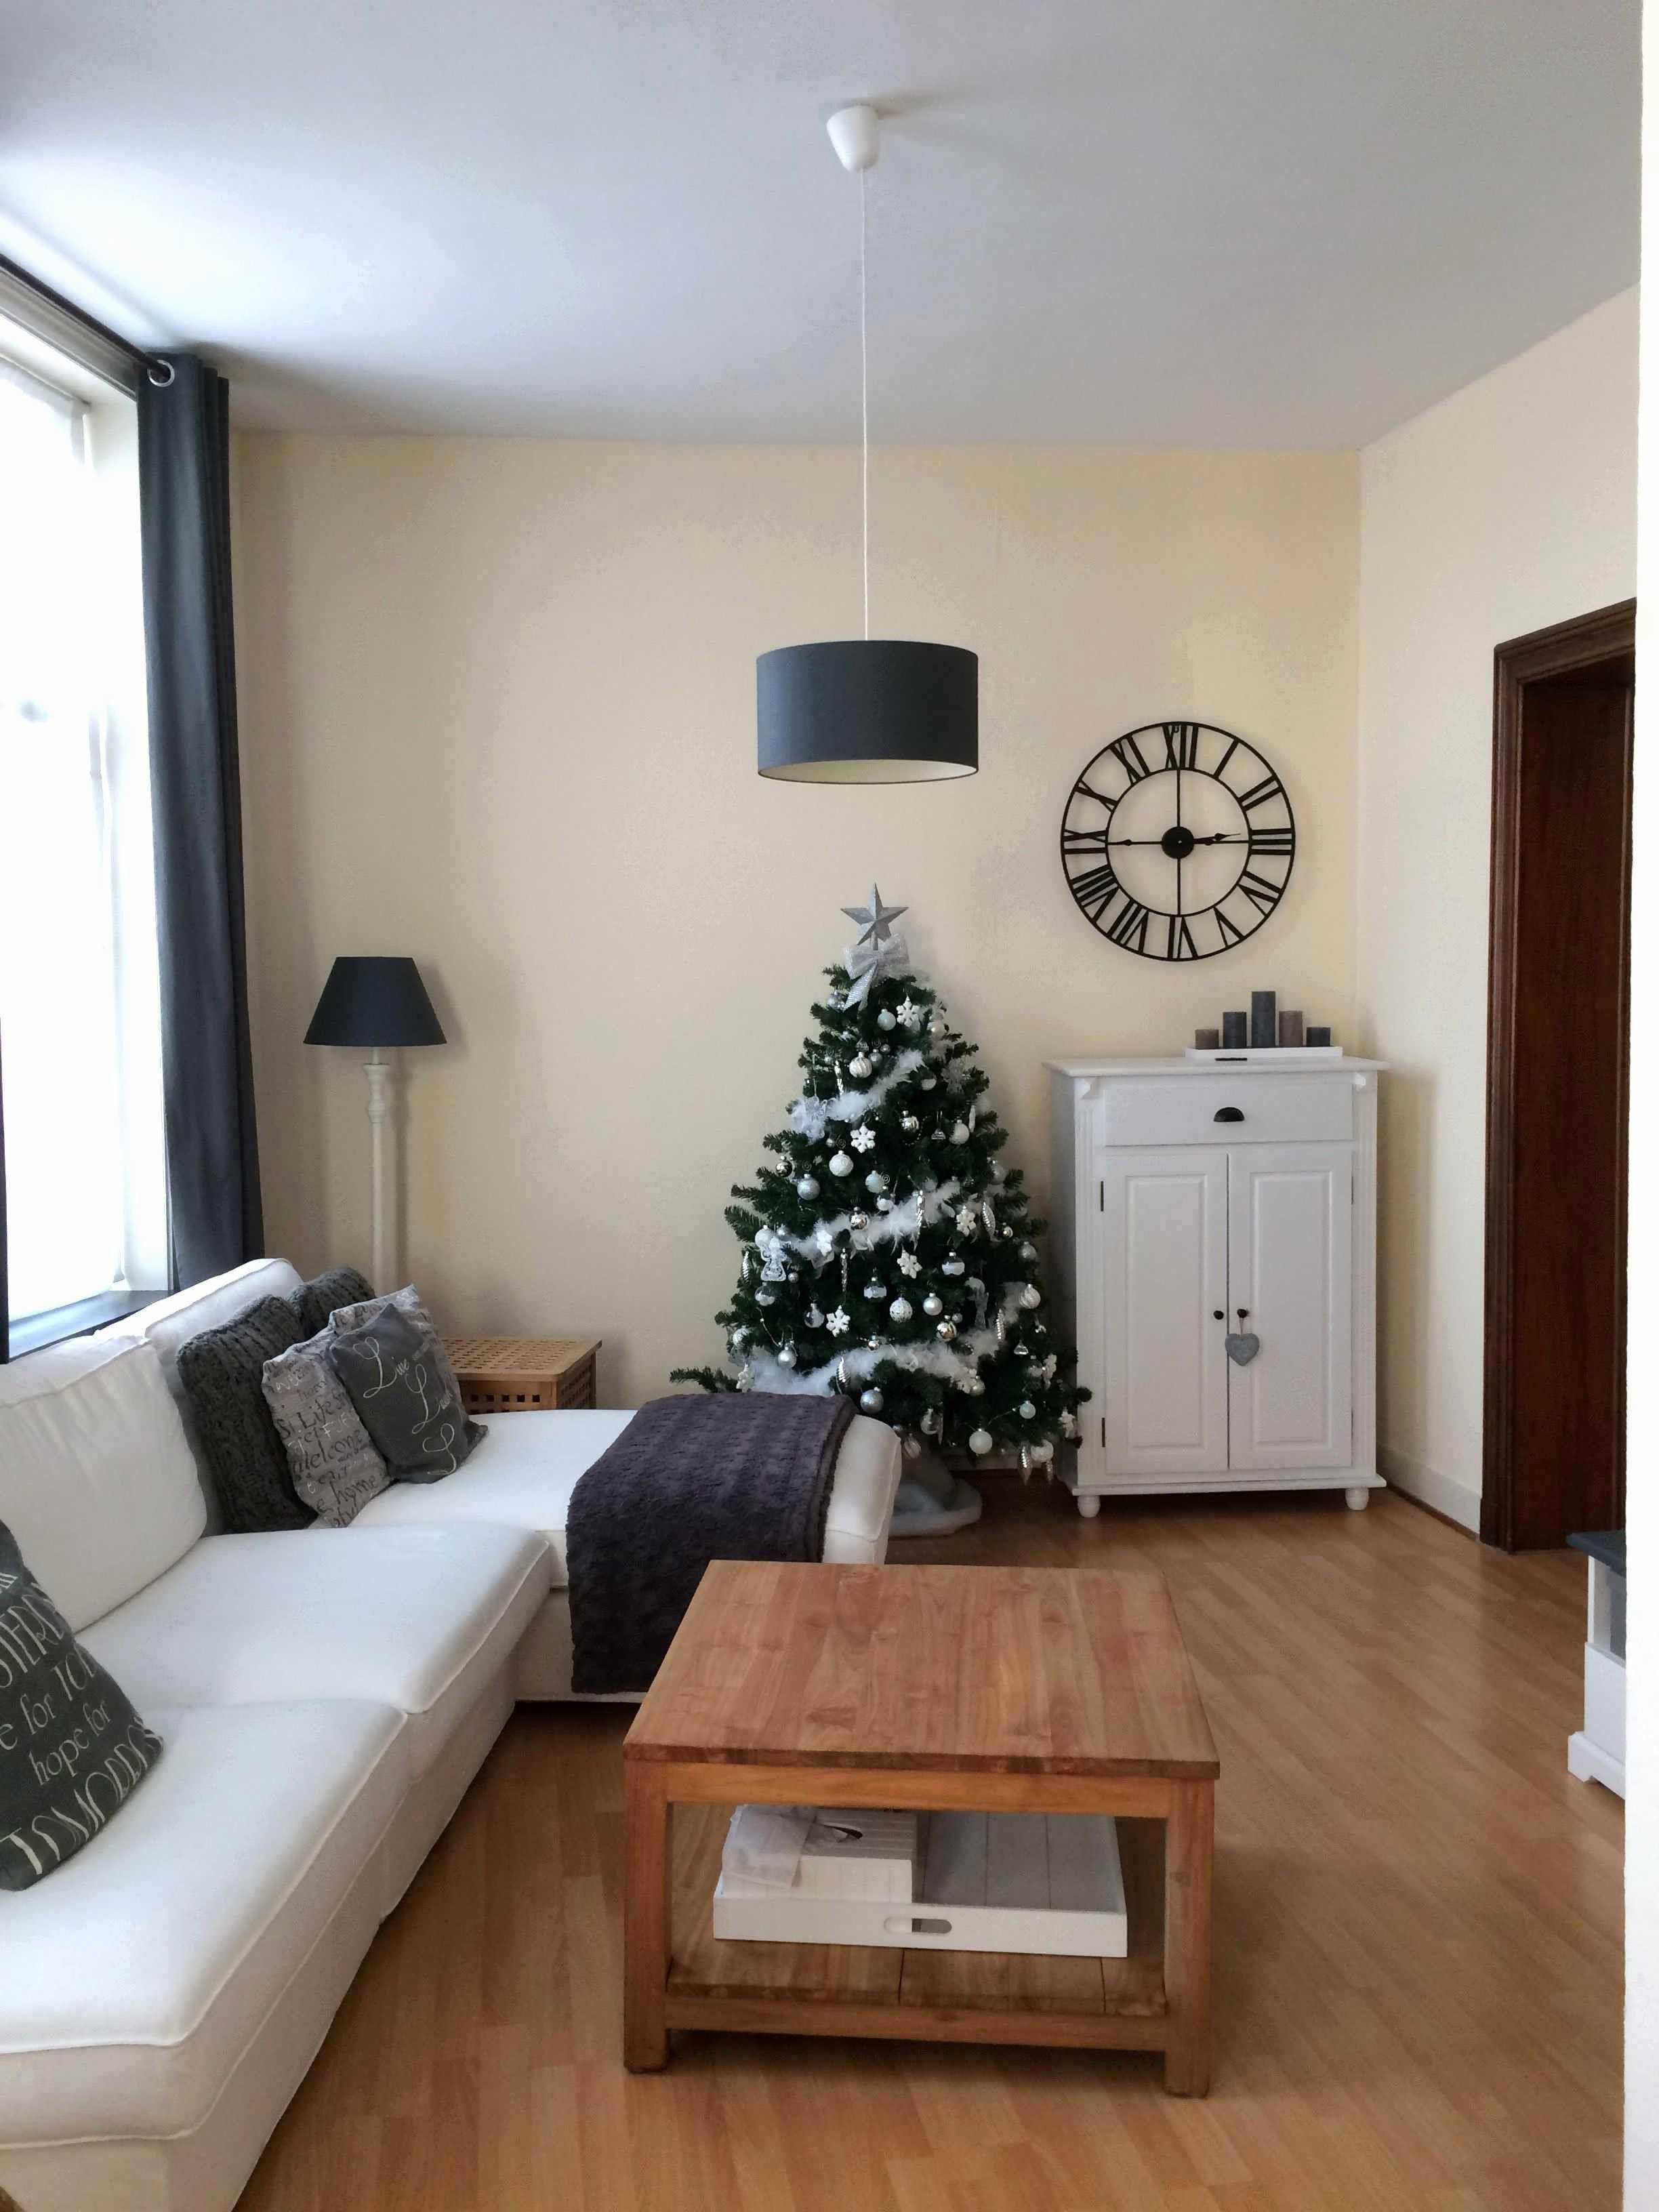 Unique Chambre Froide D Occasion Le Bon Coin Home Living Room Decor Traditional Home Decor